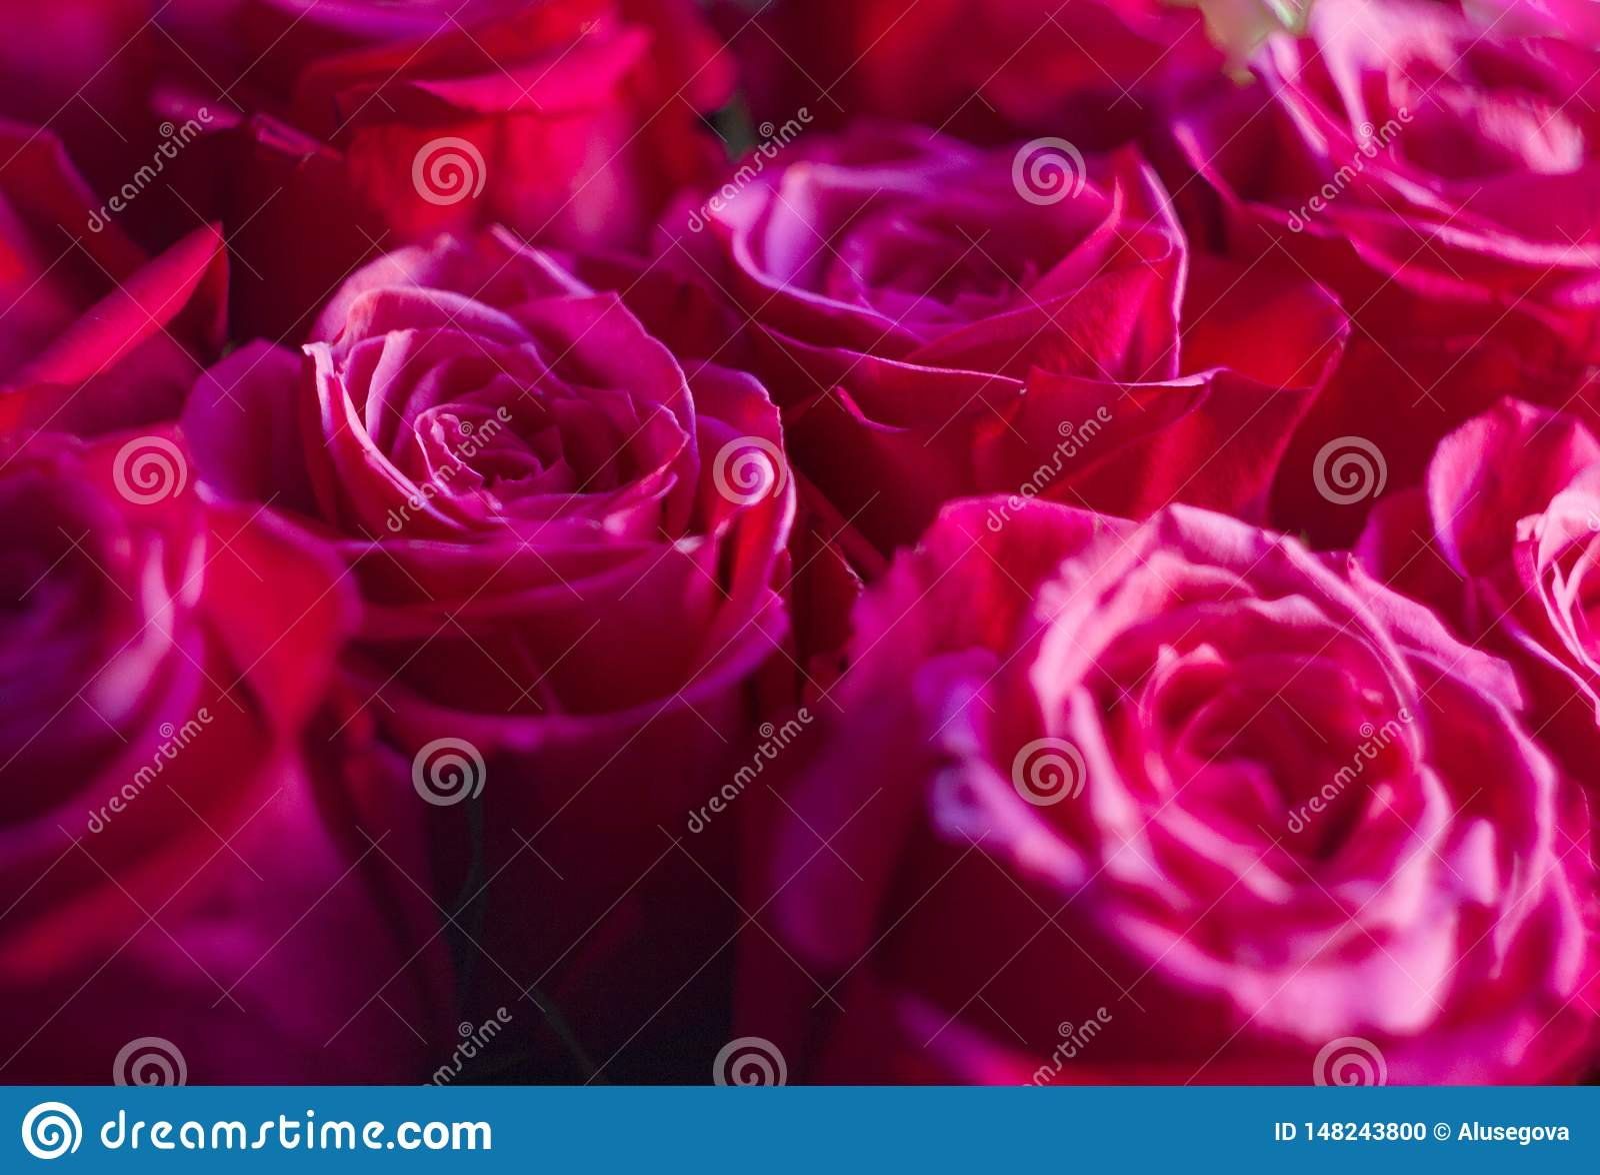 Vivid pink roses bouquet close-up